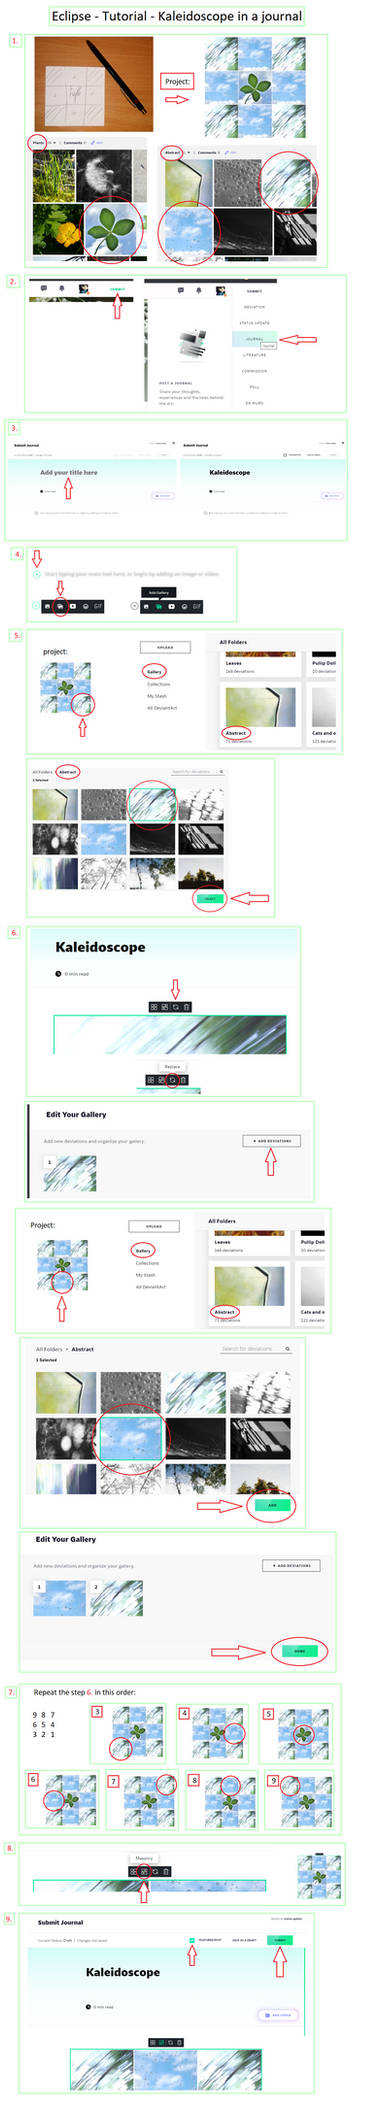 Eclipse - Tutorial - Kaleidoscope in a journal